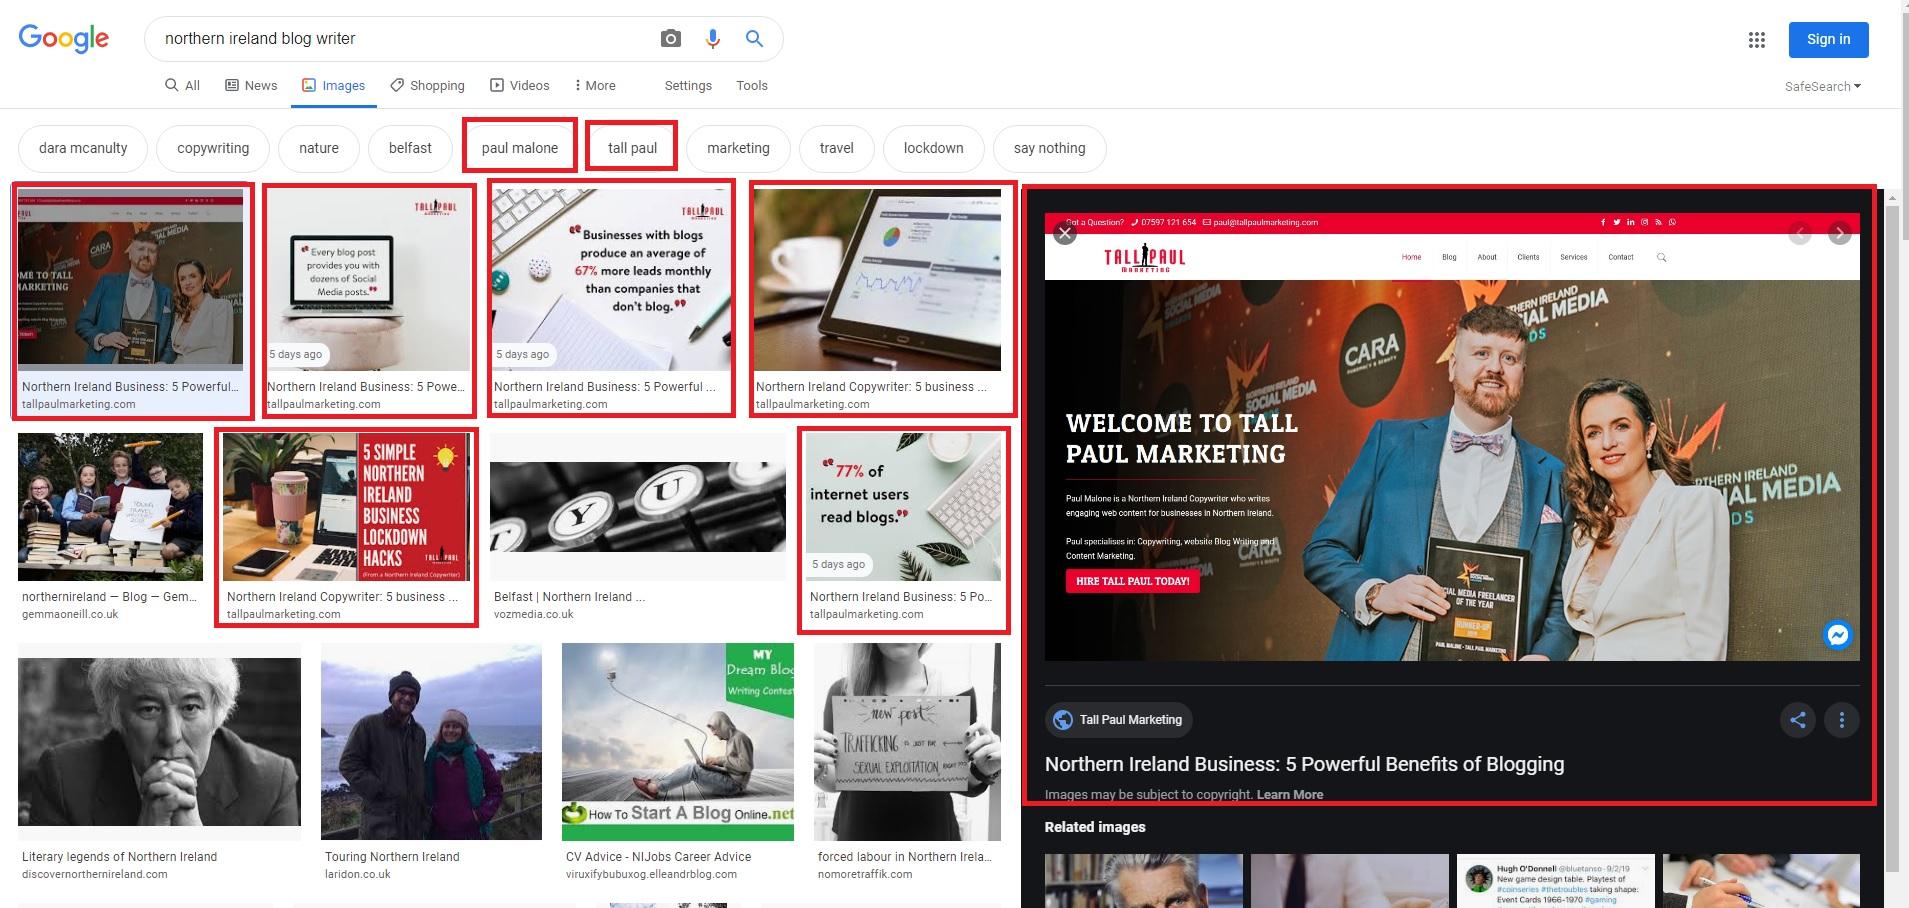 Business blogging helps improve your Google search ranking - Tall Paul Marketing - NI freelance Copywriter